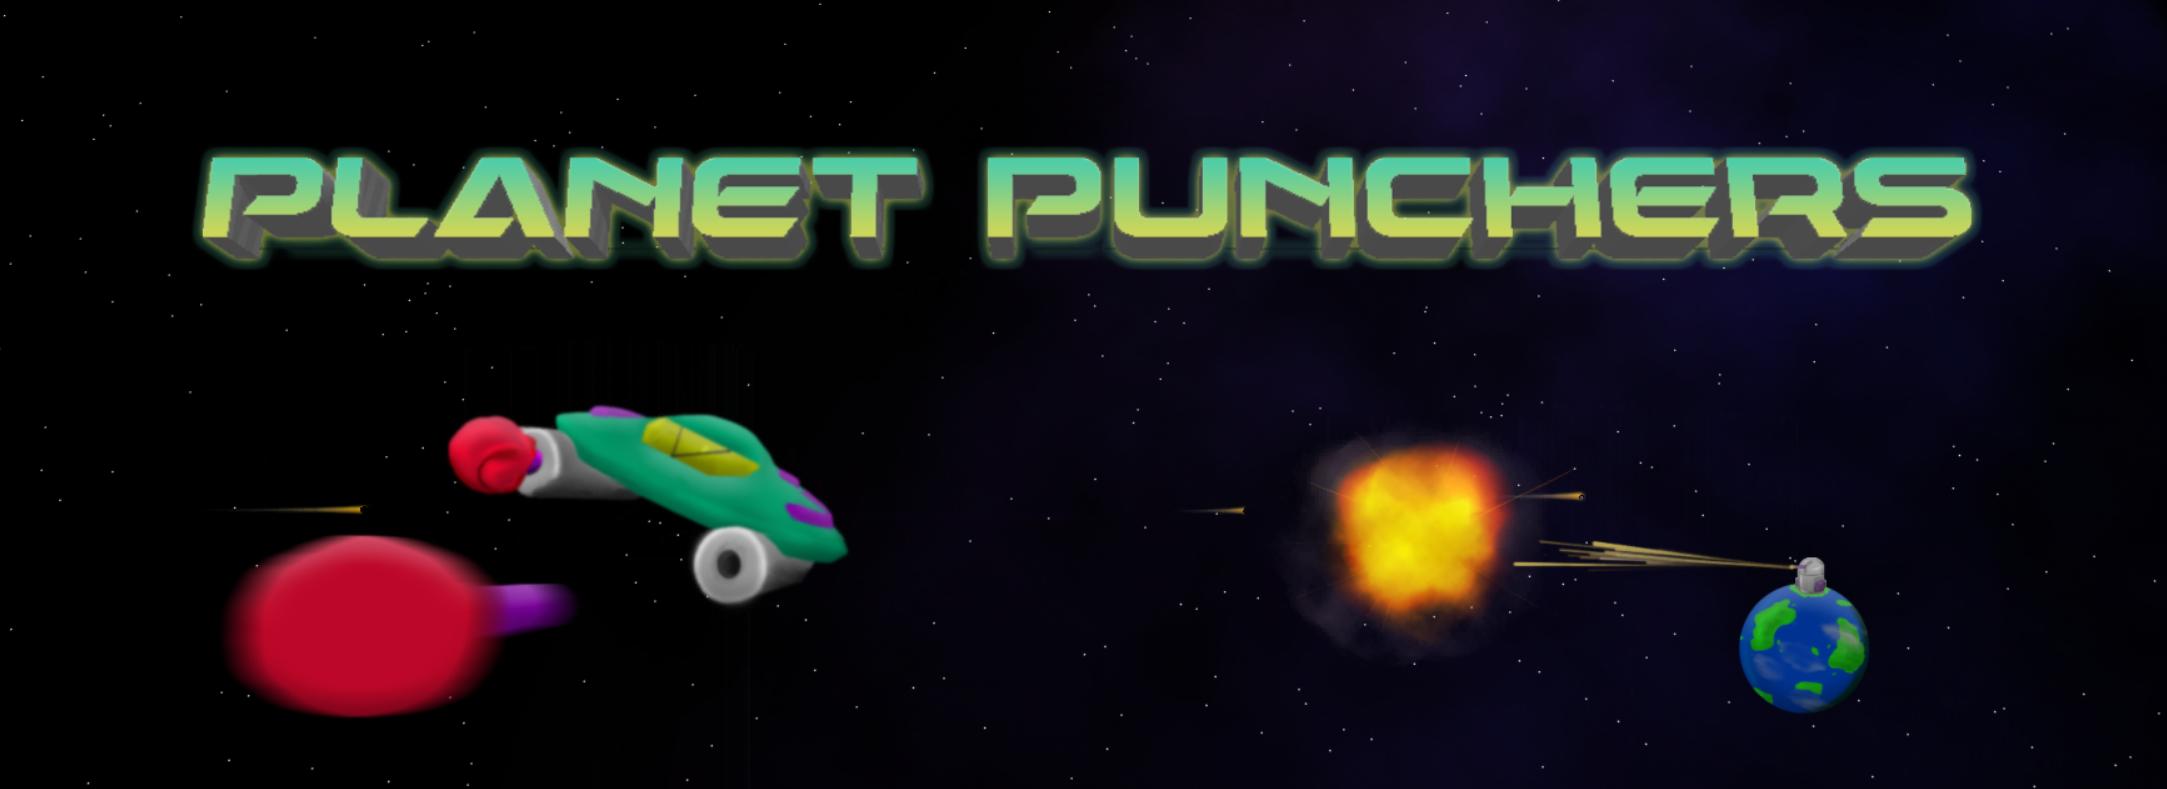 Planet Punchers